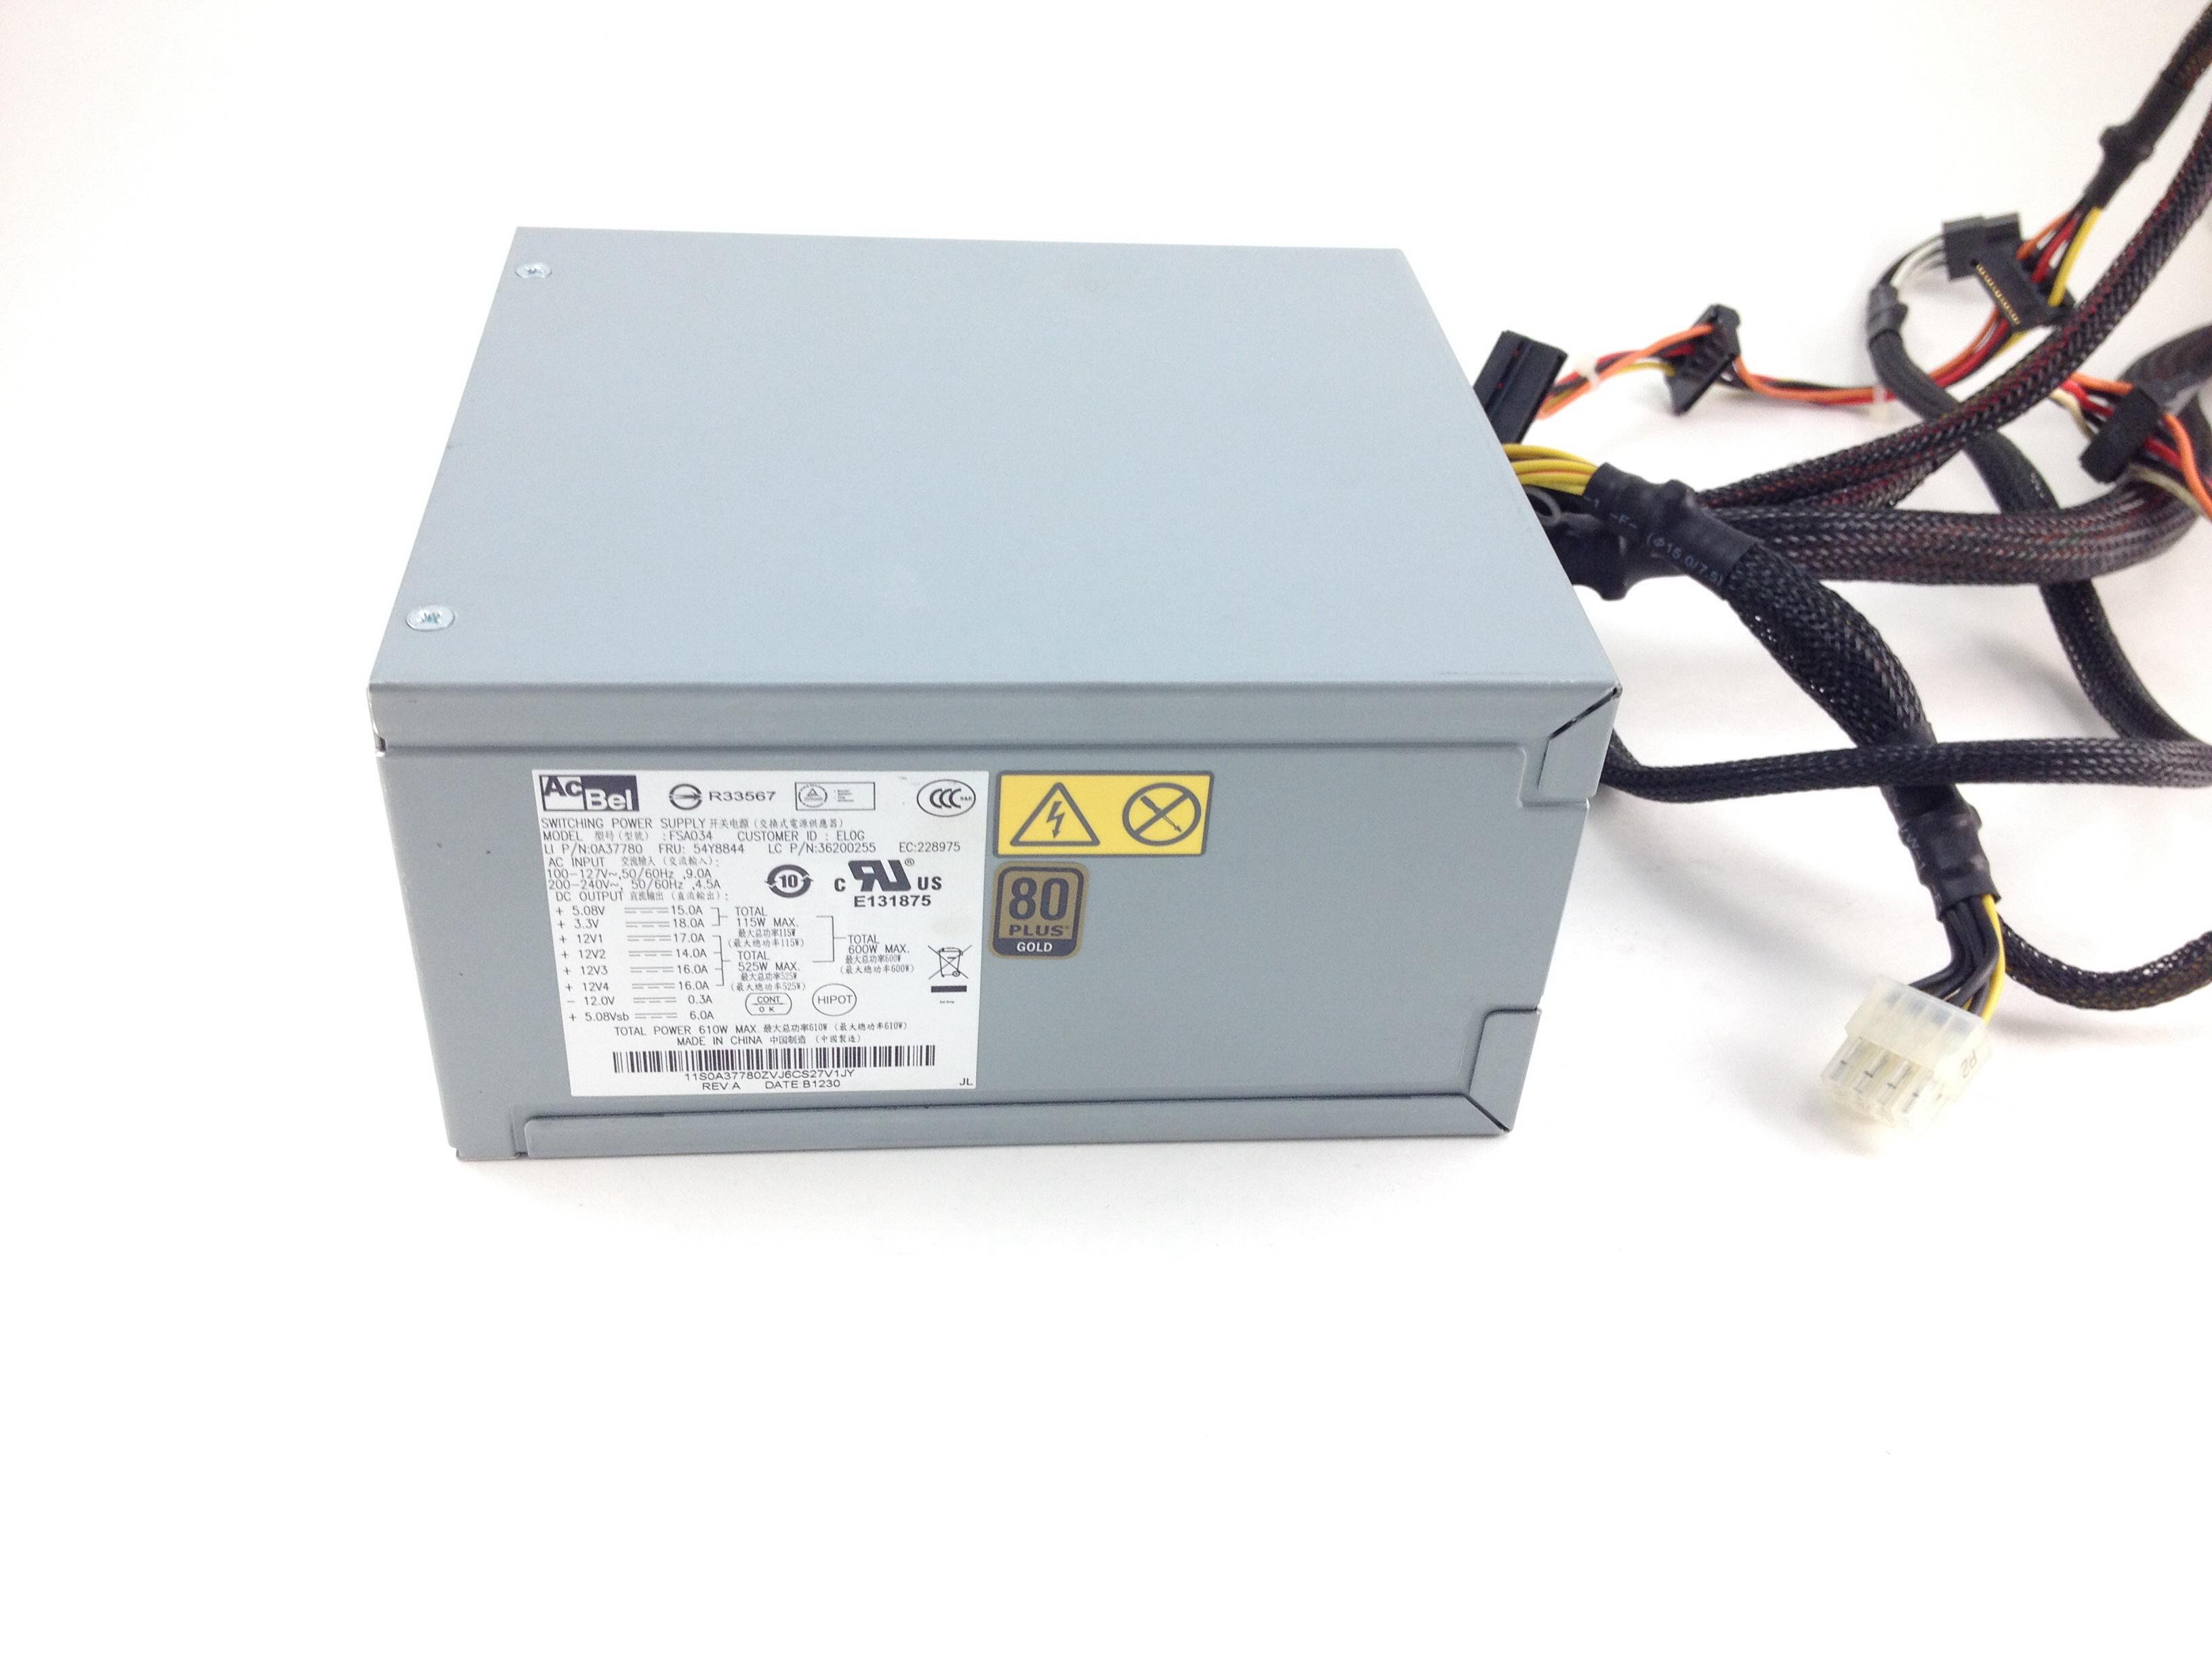 IBM 610W Thinkstation S30 Power Supply (54Y8844)